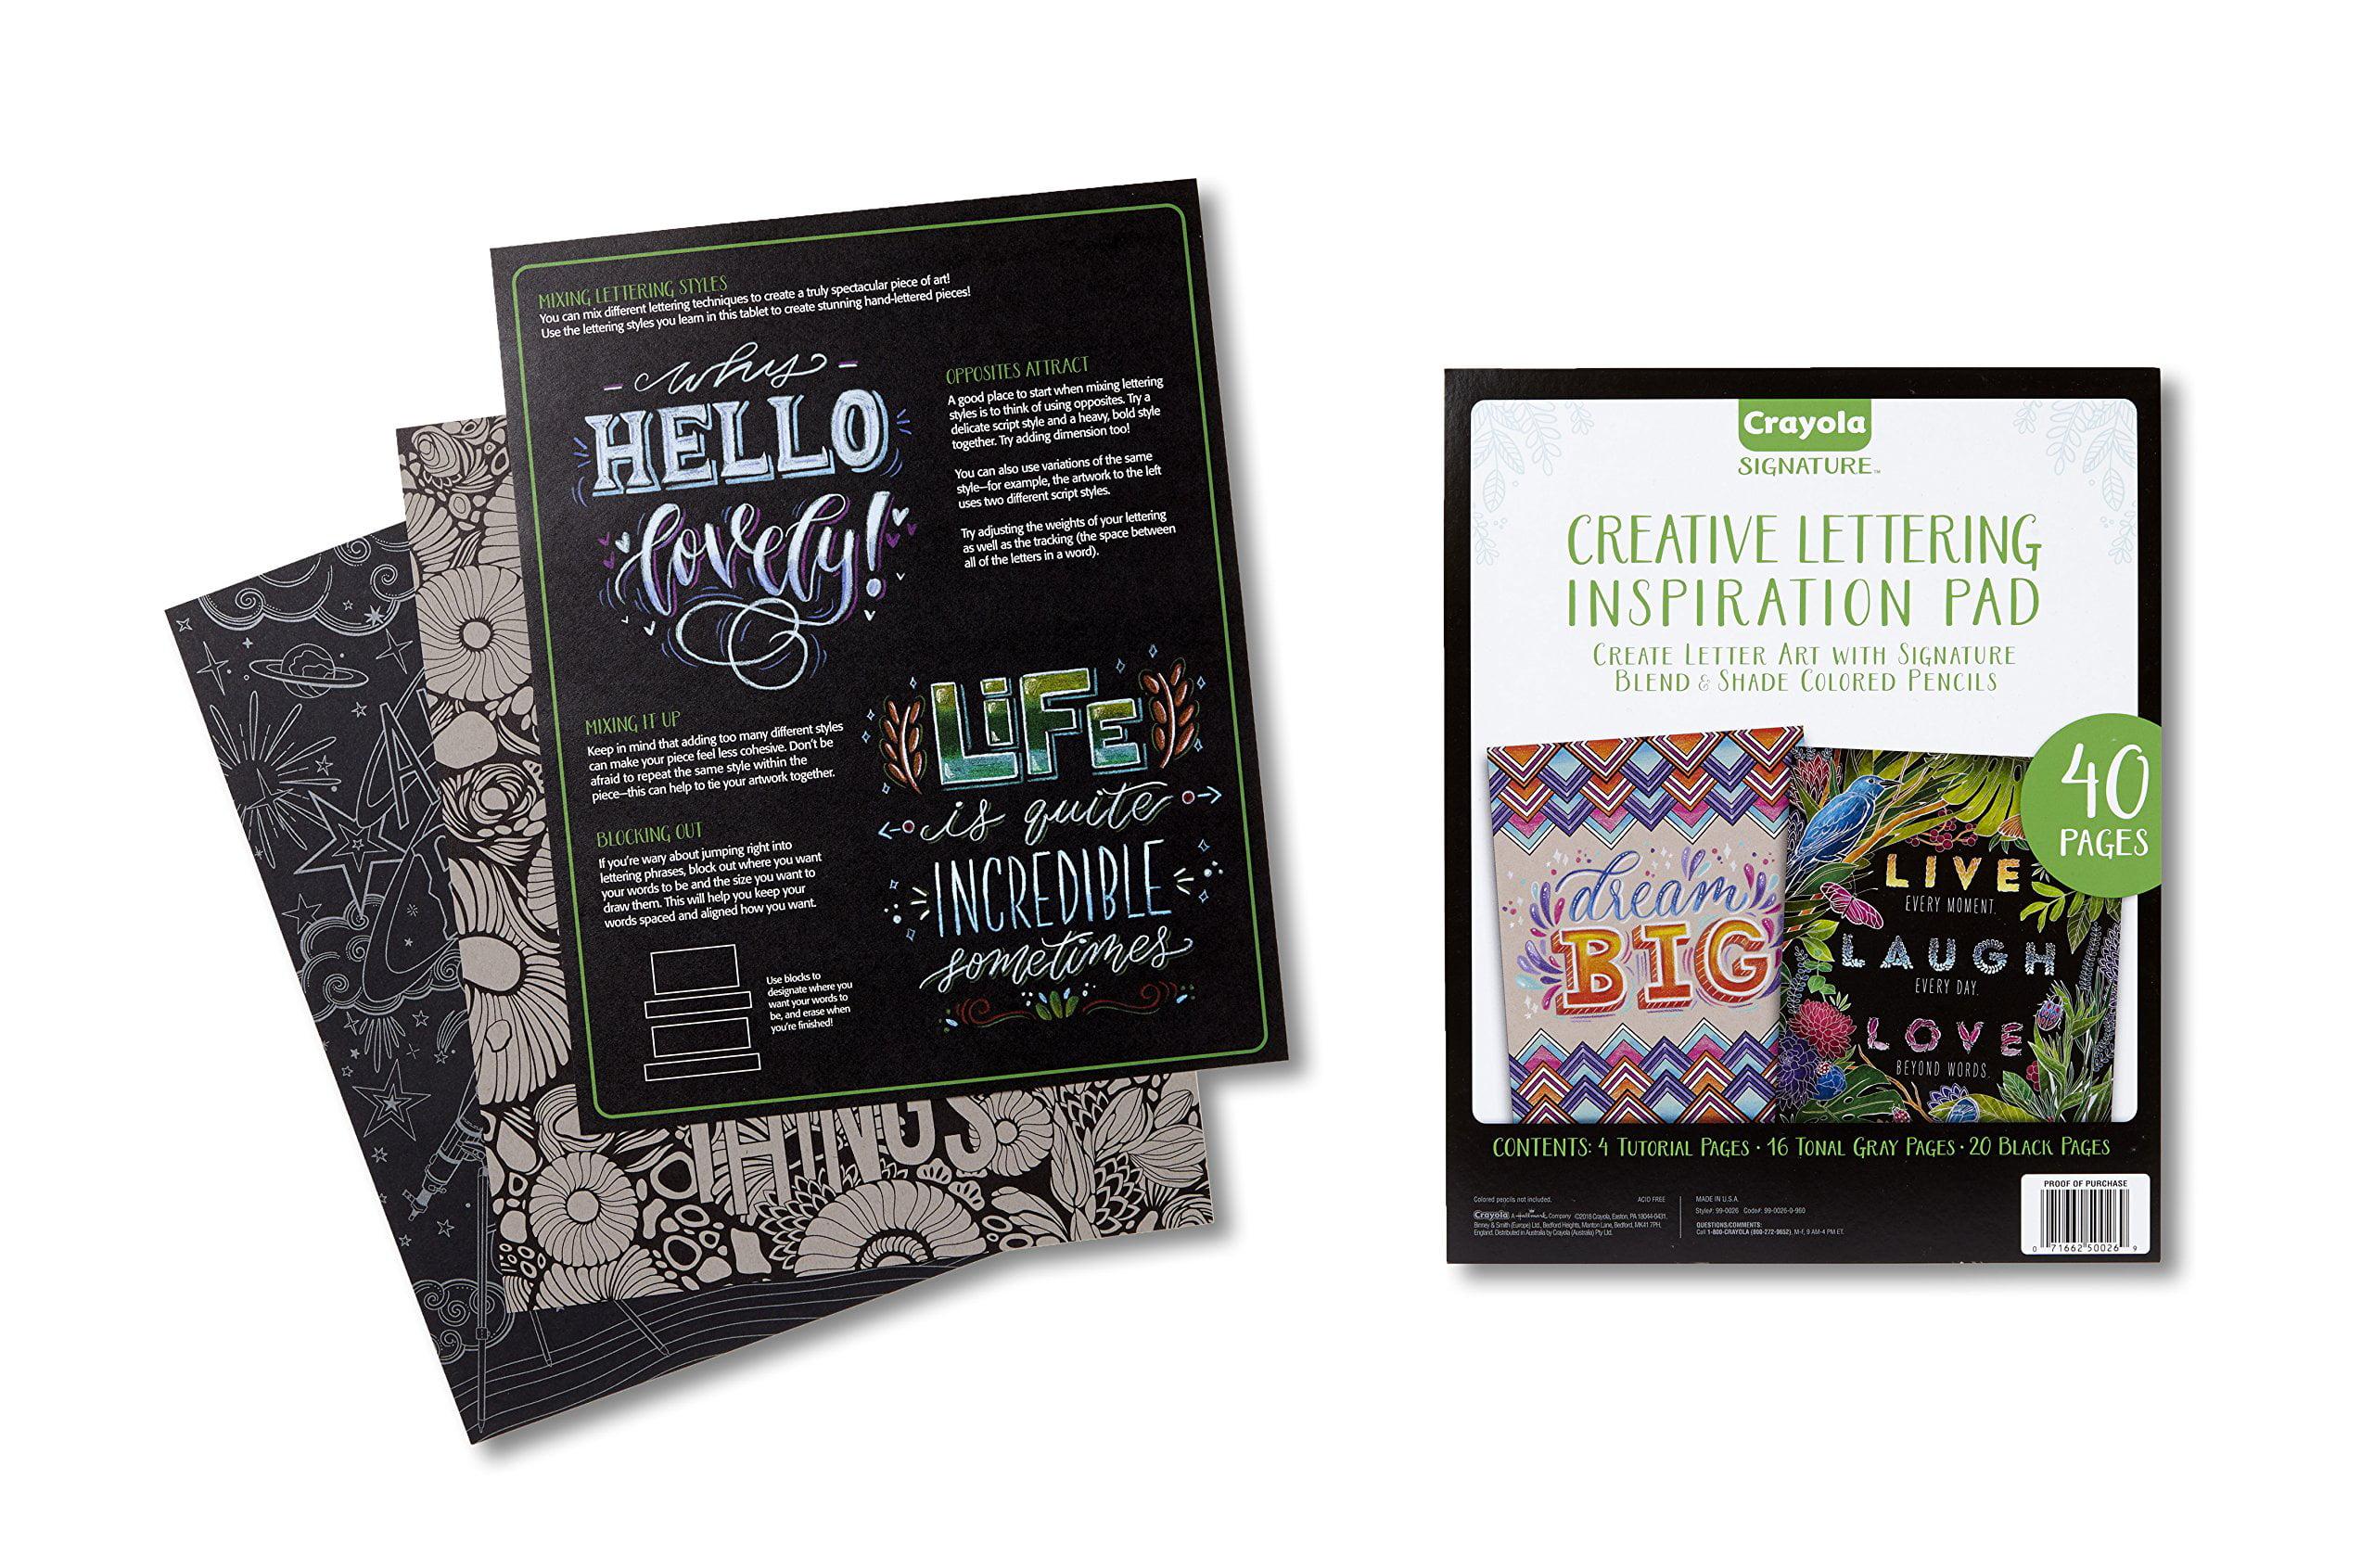 Crayola Signature Activity Pad, Hand Lettering Tutorials And ...